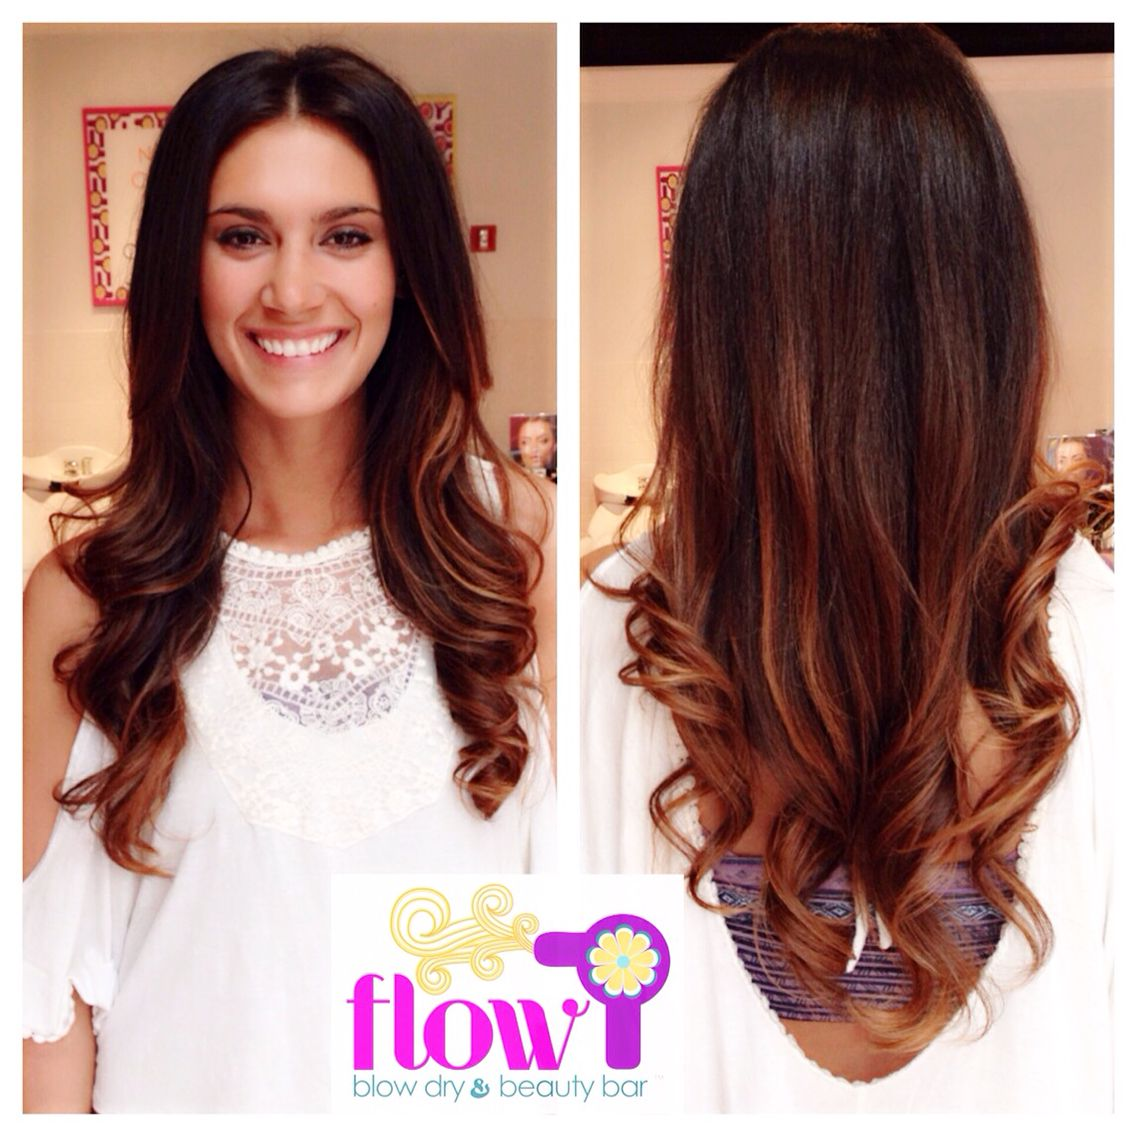 Beautiful blowout hair prettyhair blowdry flowblowdrybar